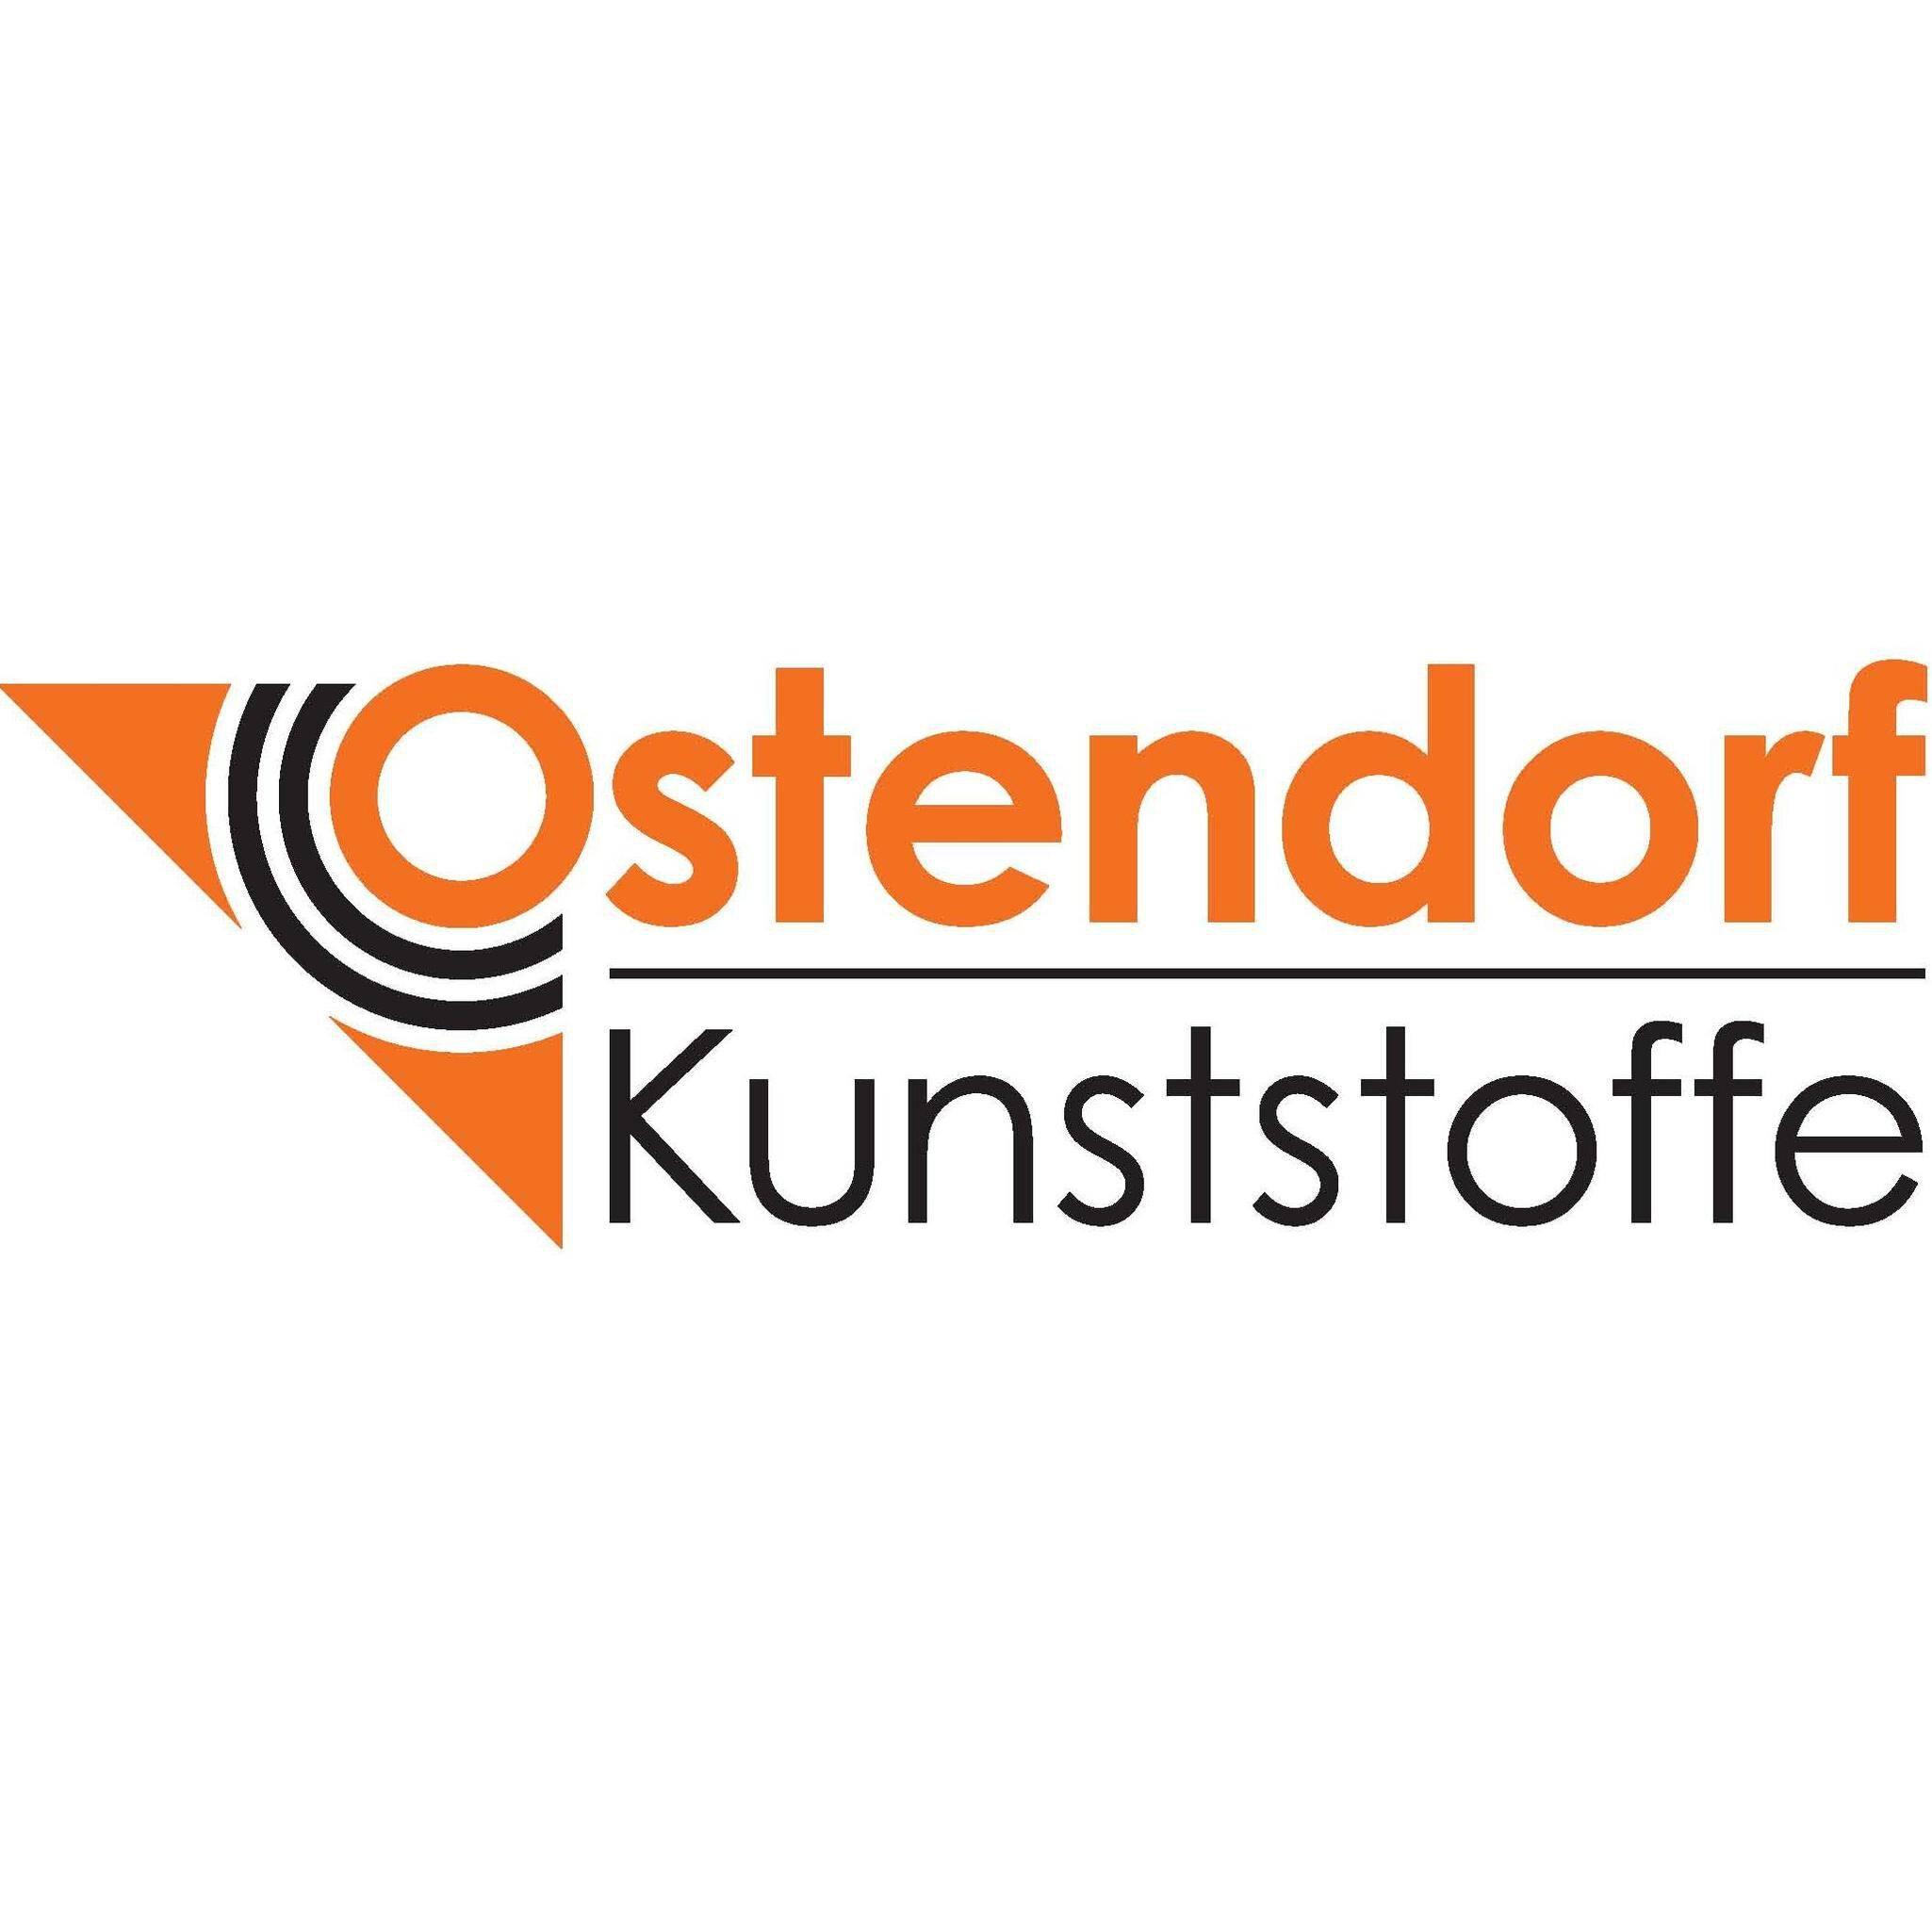 Company logo of Gebr. Ostendorf Kunststoffe GmbH